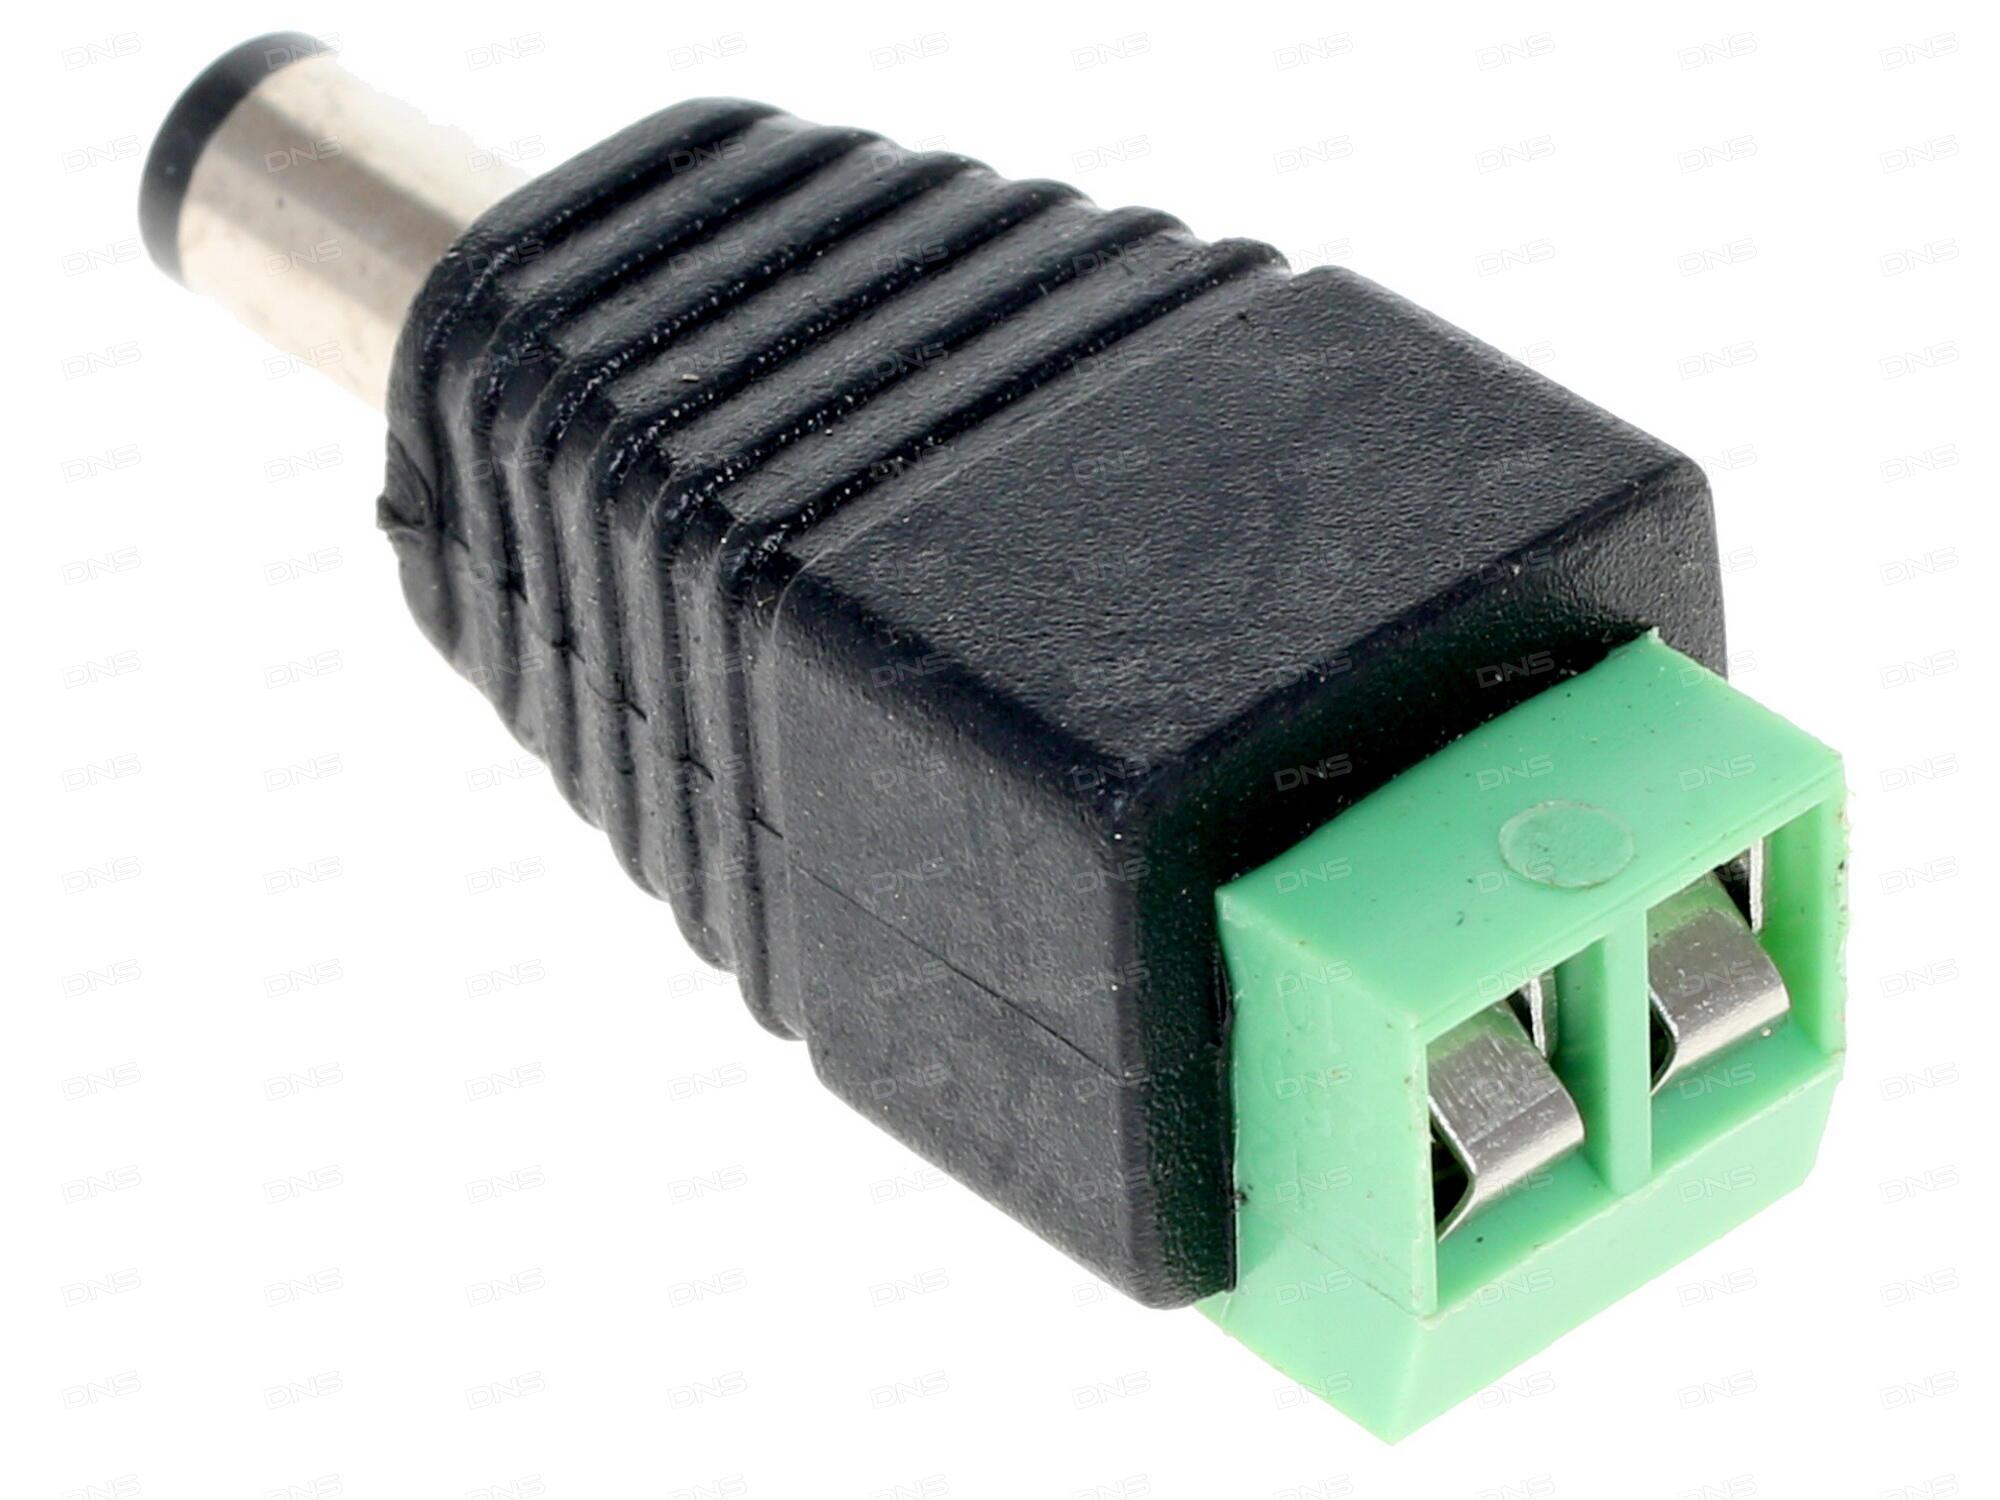 IP-камера Falcon Eye FE-IPC-BL200P 2 мегапиксельная уличная H.264 протокол ONVIF разрешение 1080P матрица 1/2.8